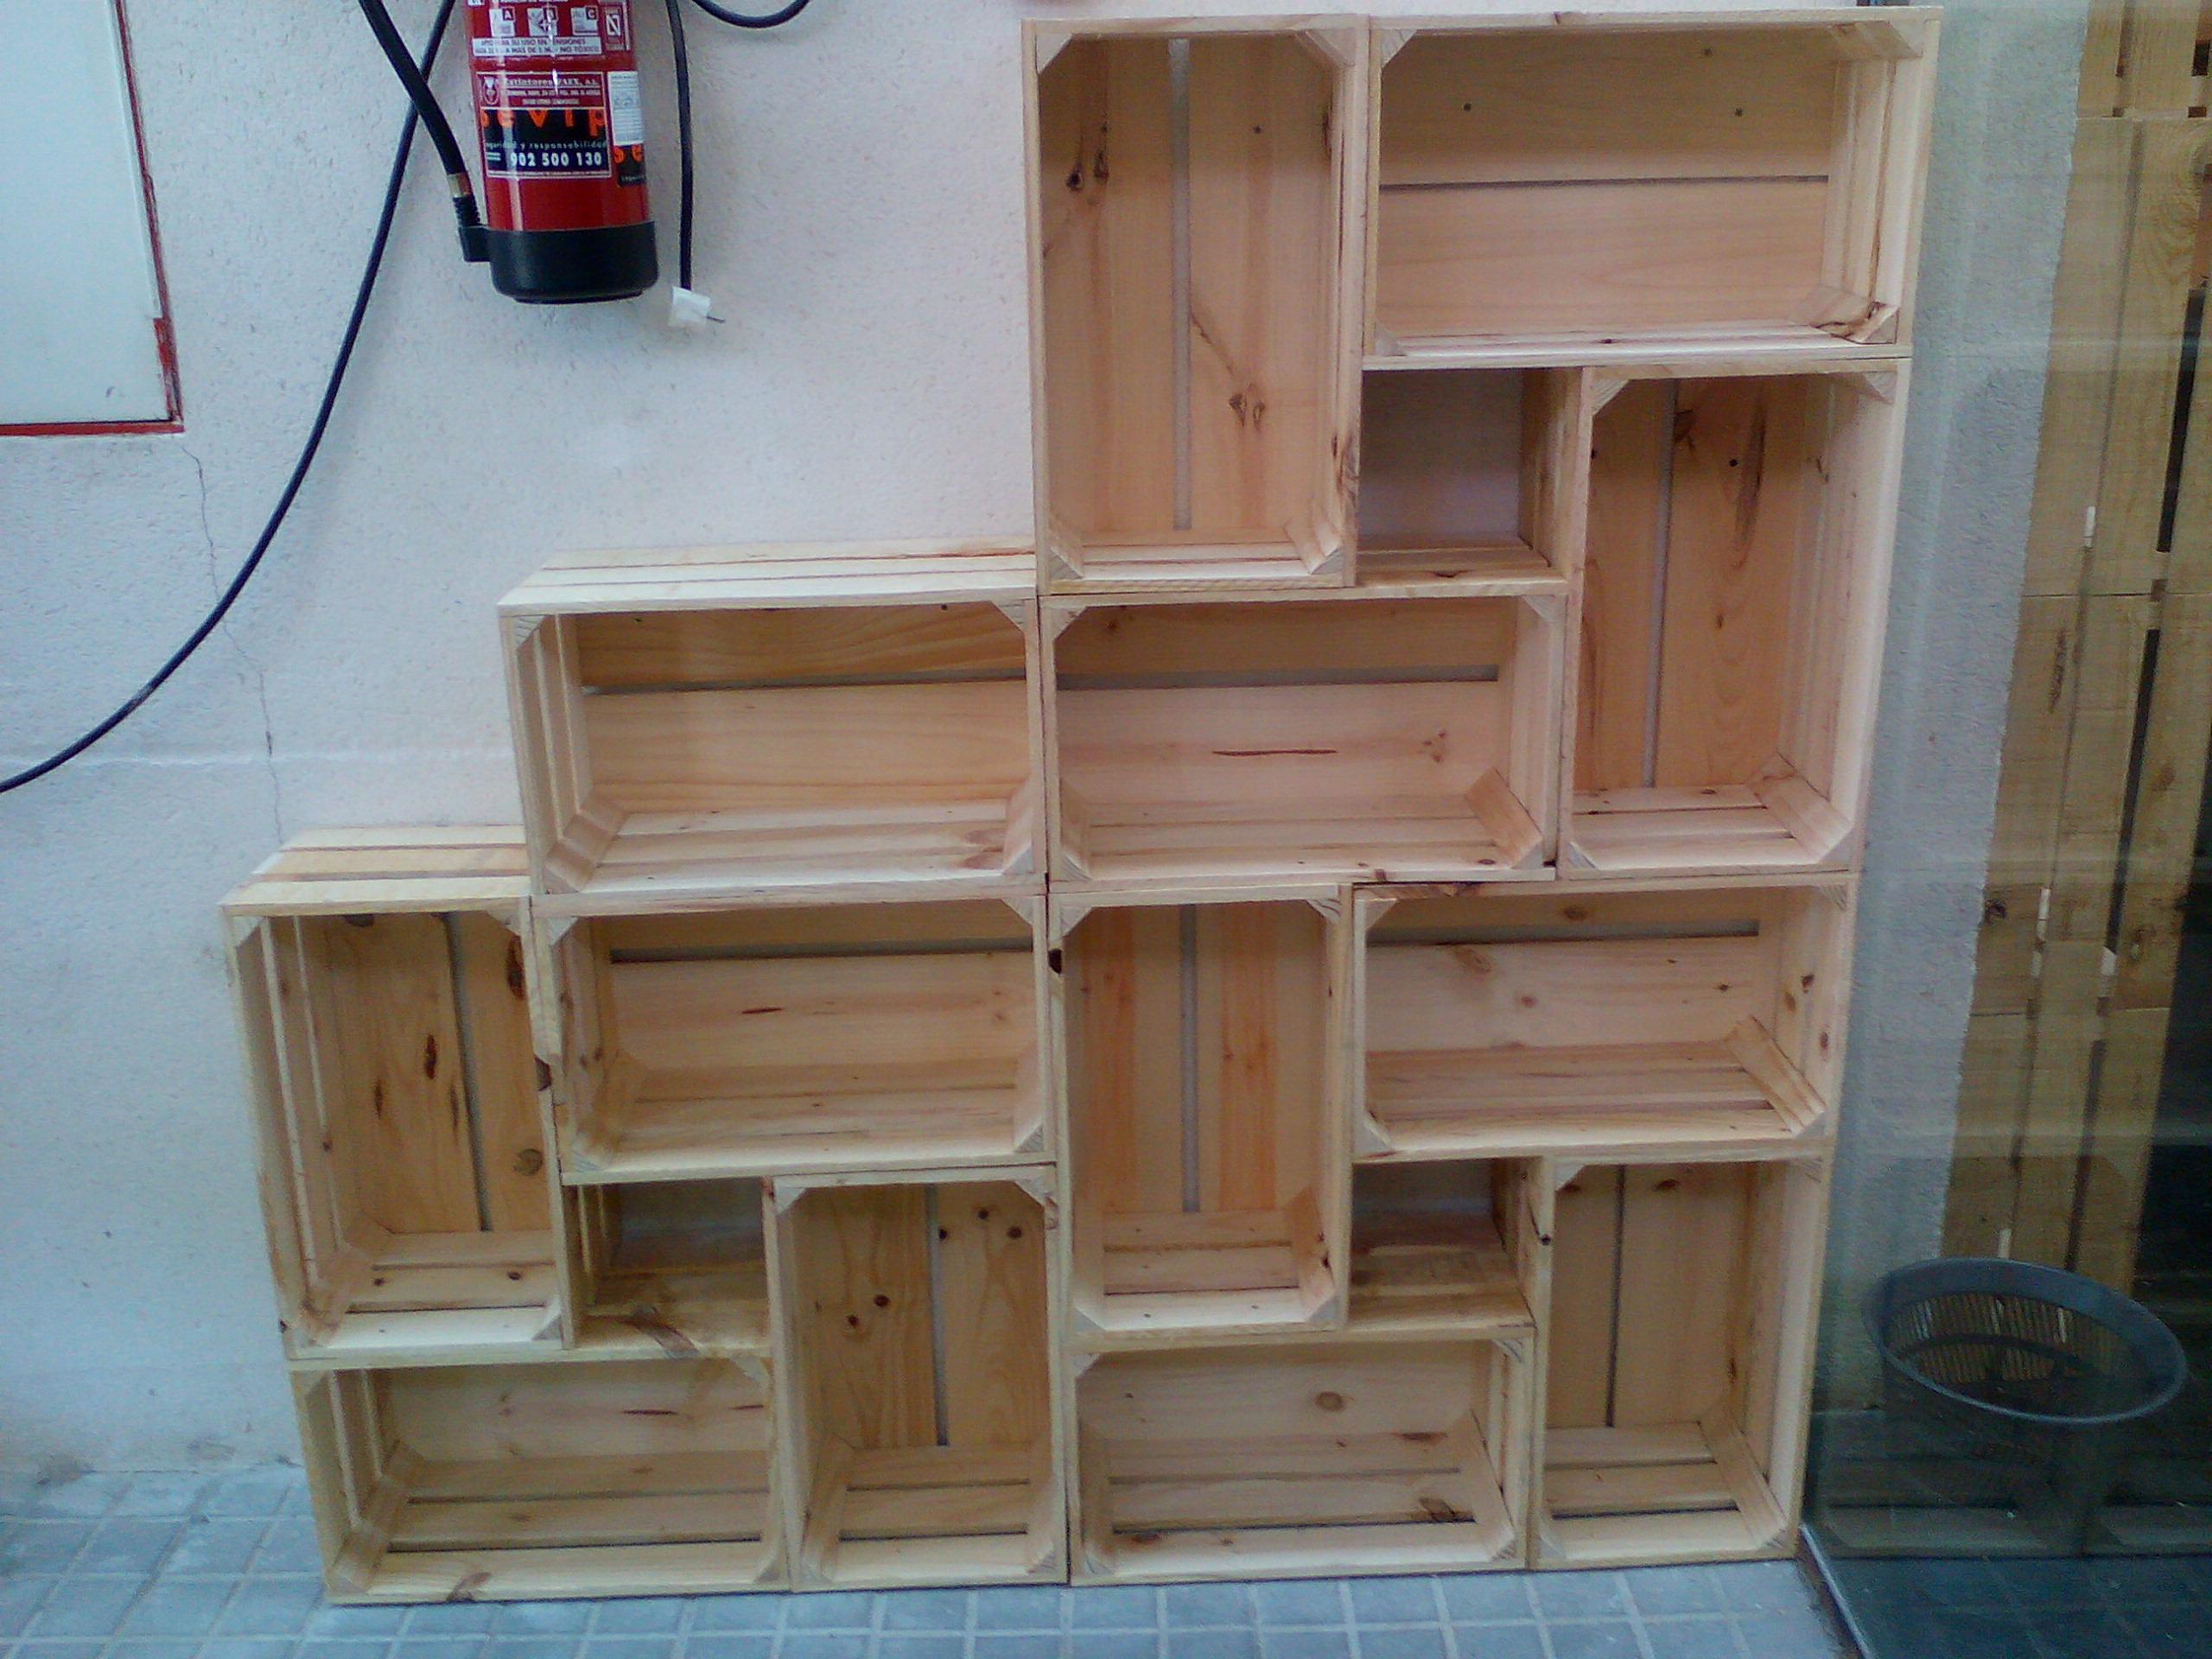 Estanter as cajas madera natural for Estanterias con cajas de madera